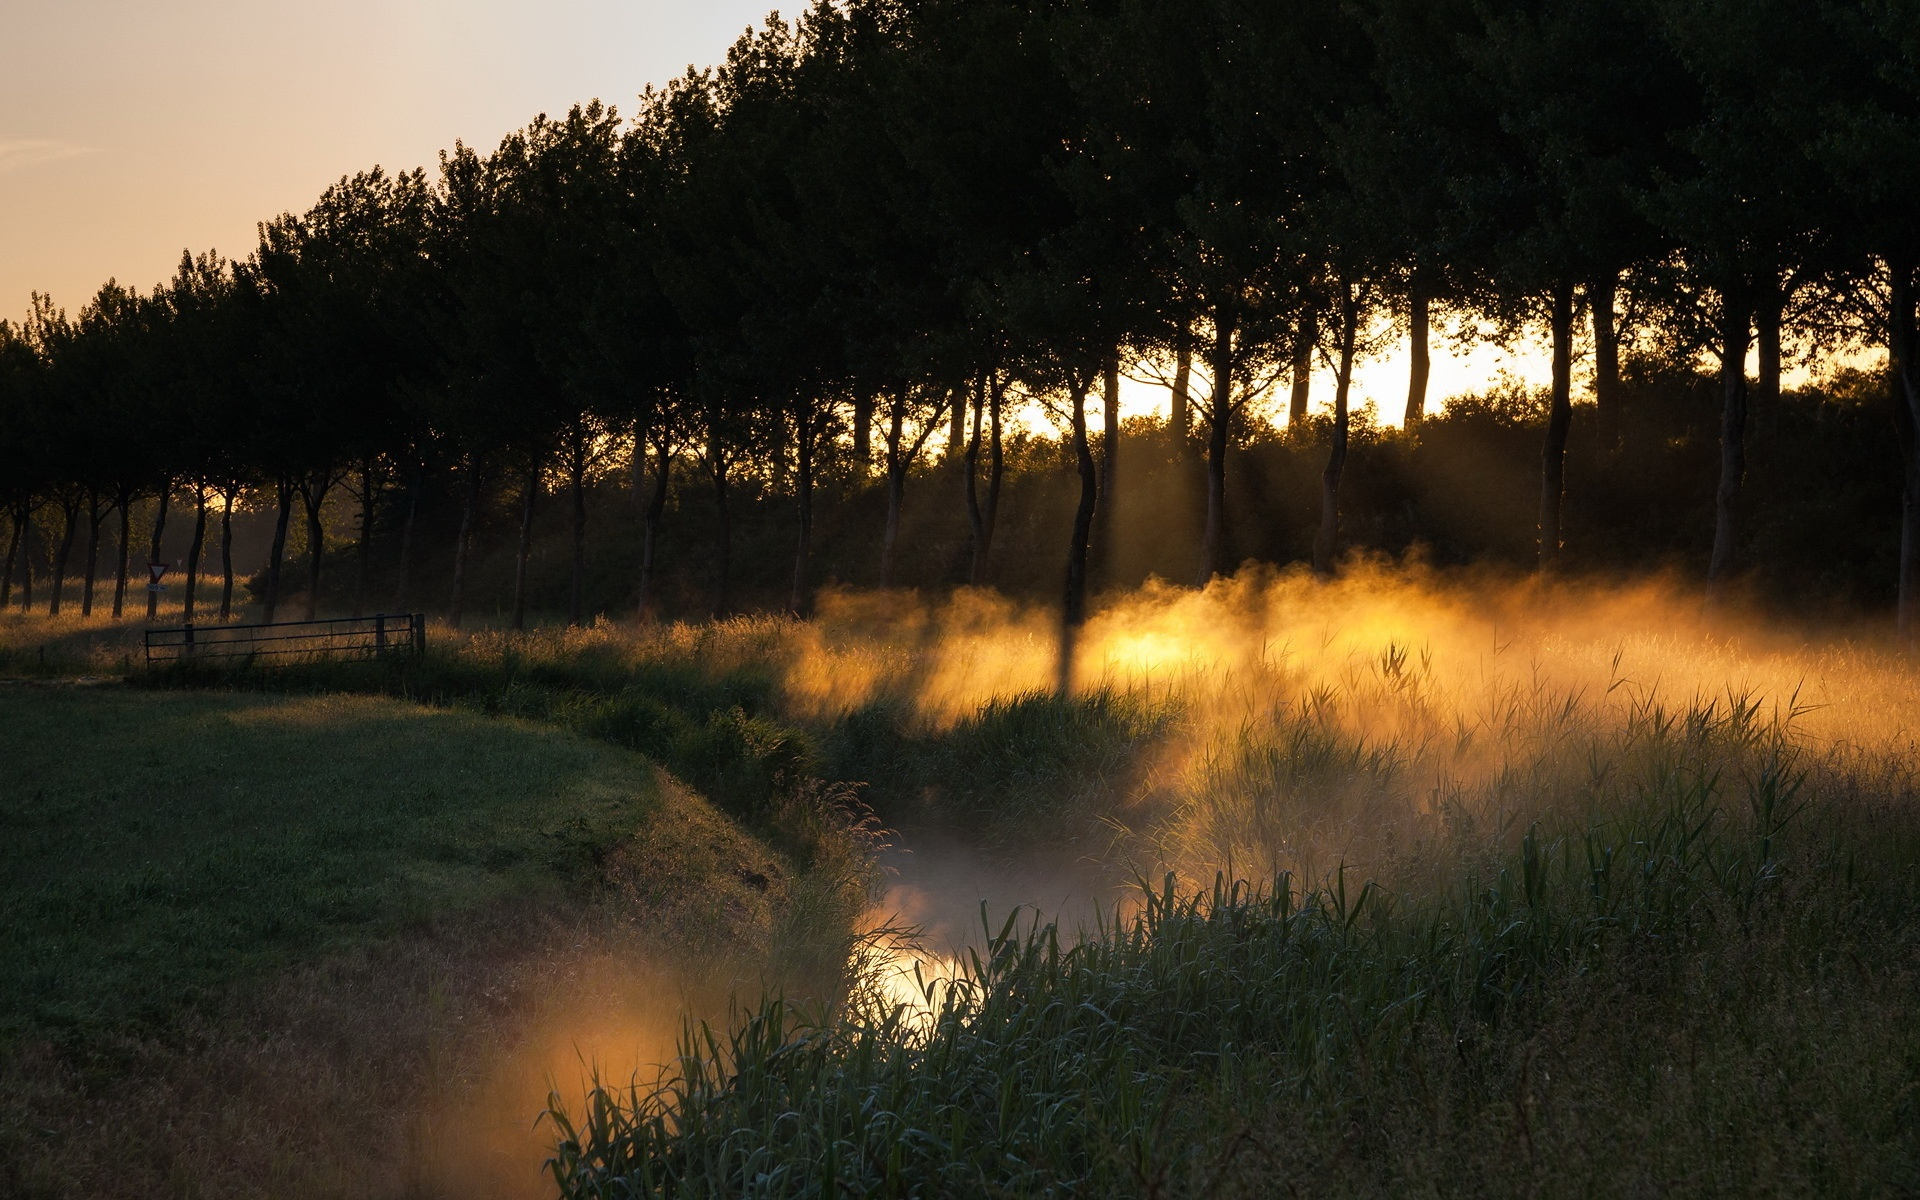 Закат в тумане в лесу  № 1140034 бесплатно